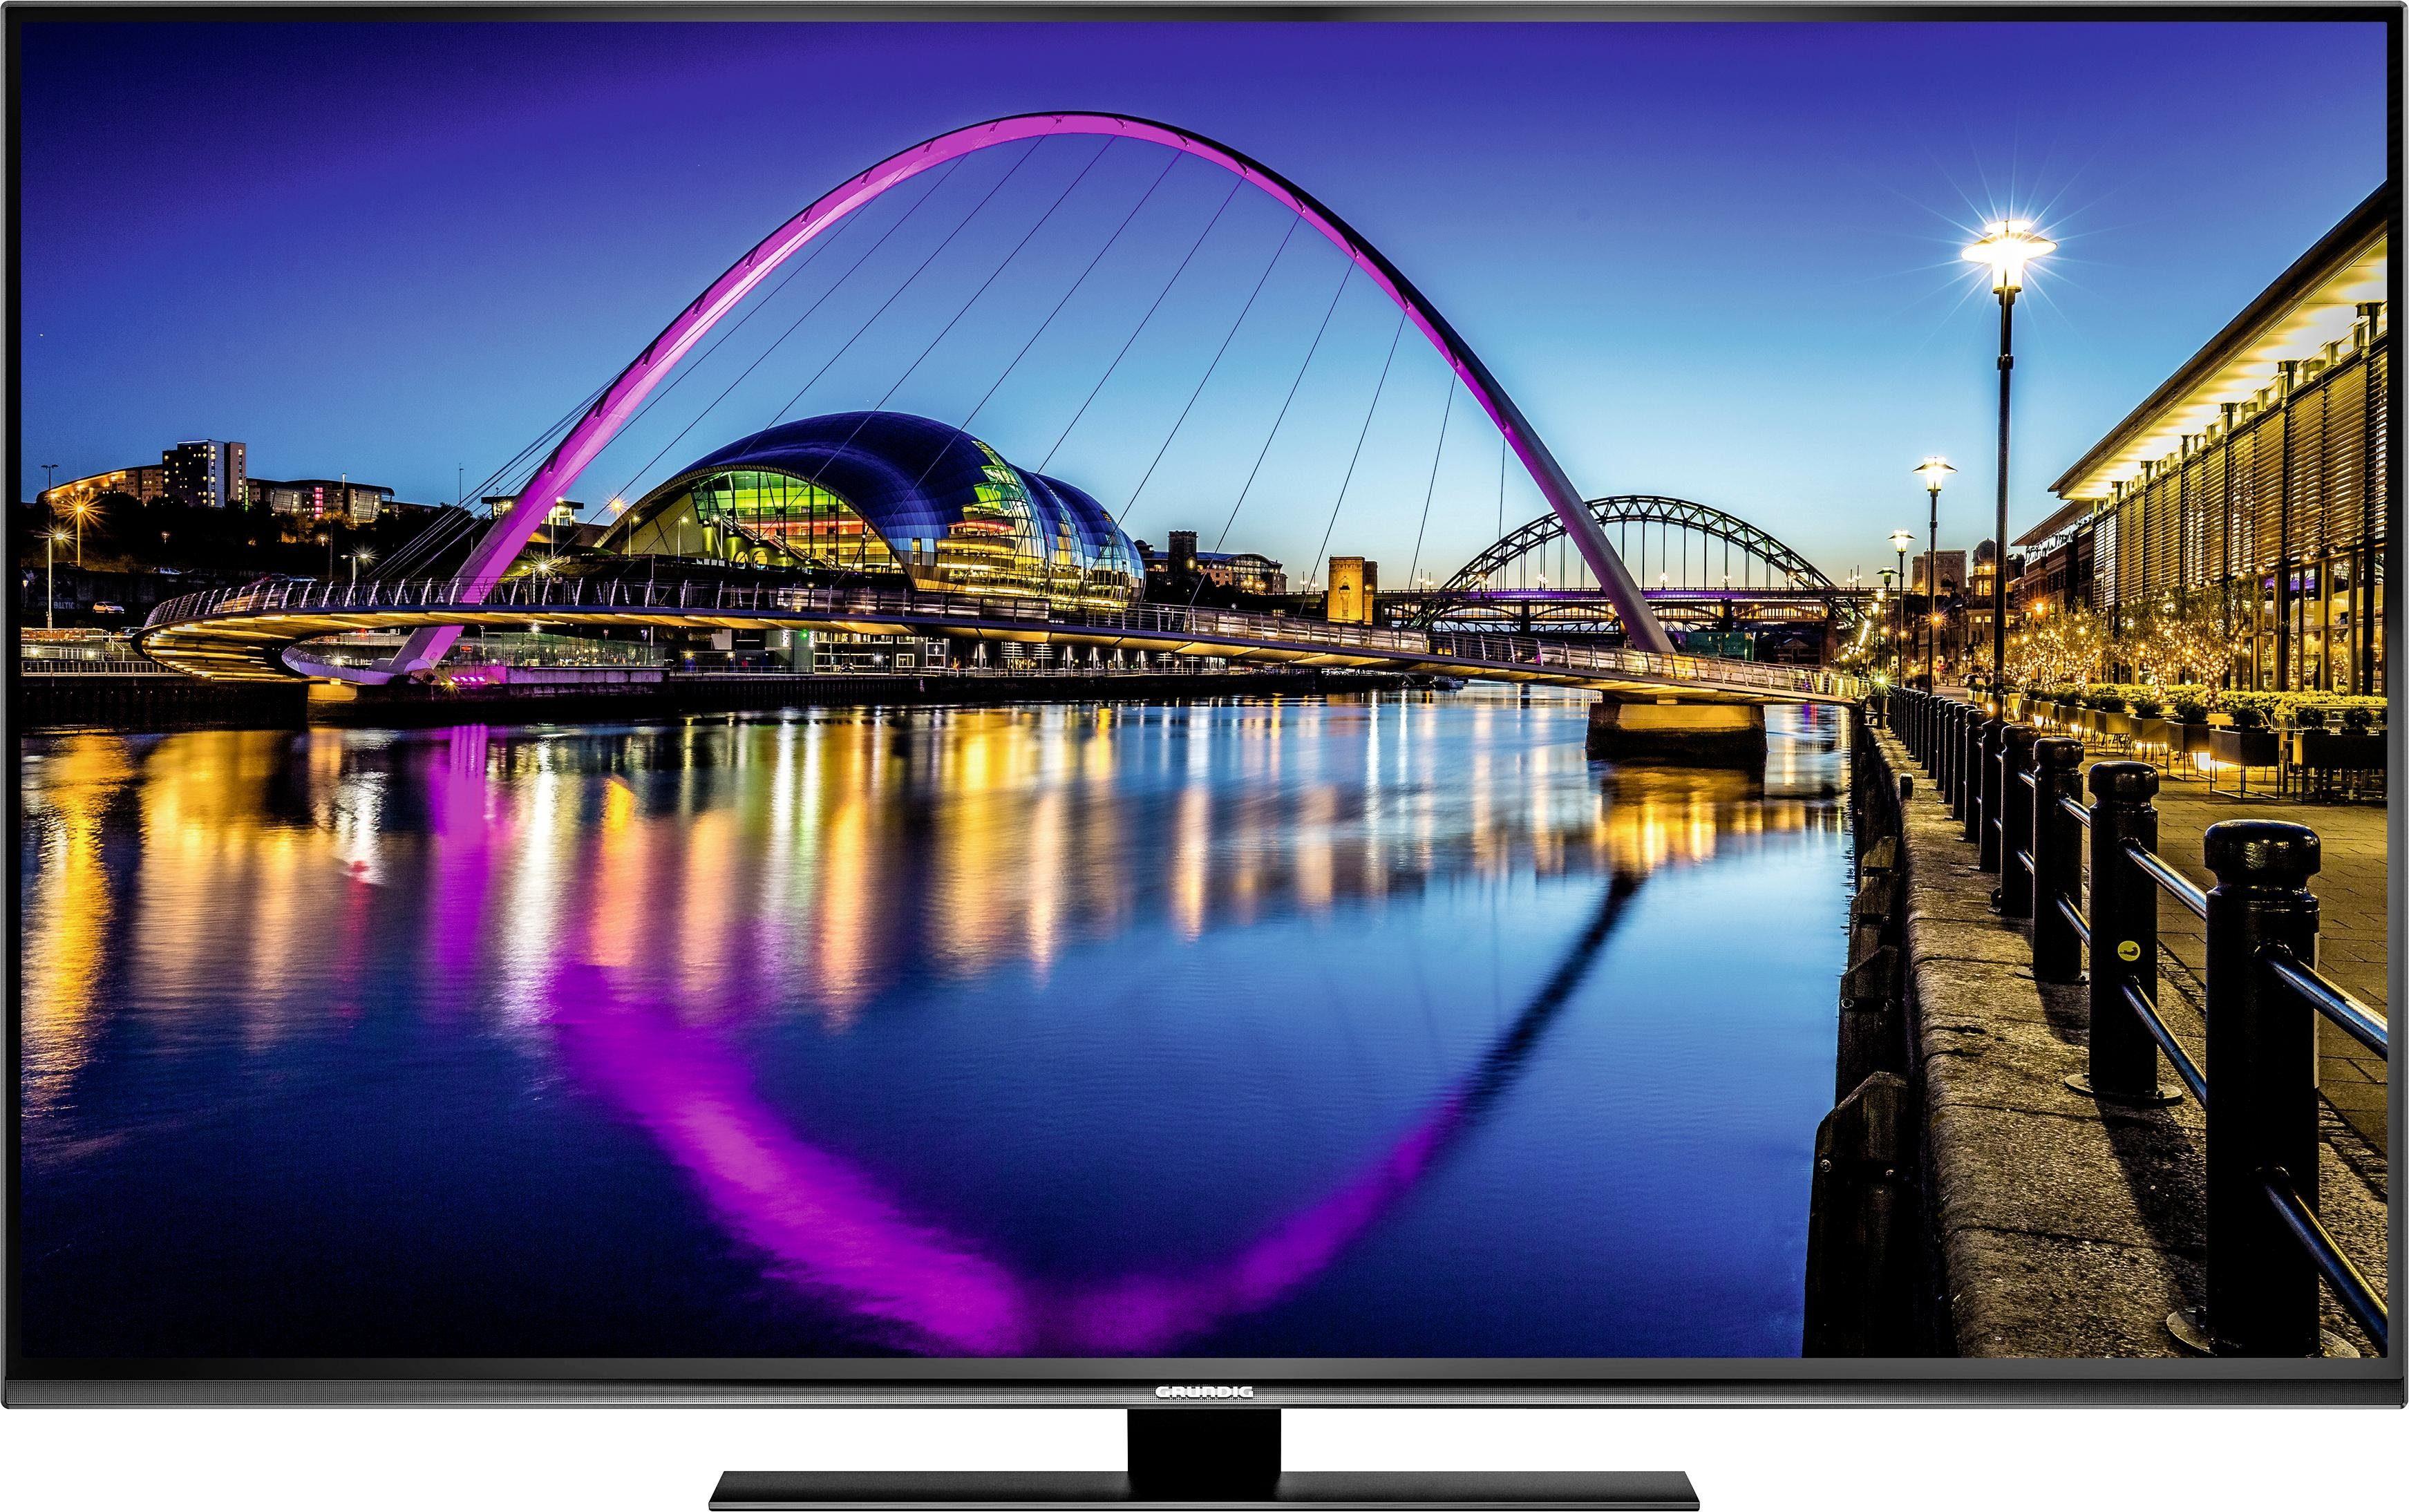 Grundig 65 GUB 9890 LED-Fernseher (164 cm/65 Zoll, 4K Ultra HD, Smart-TV)